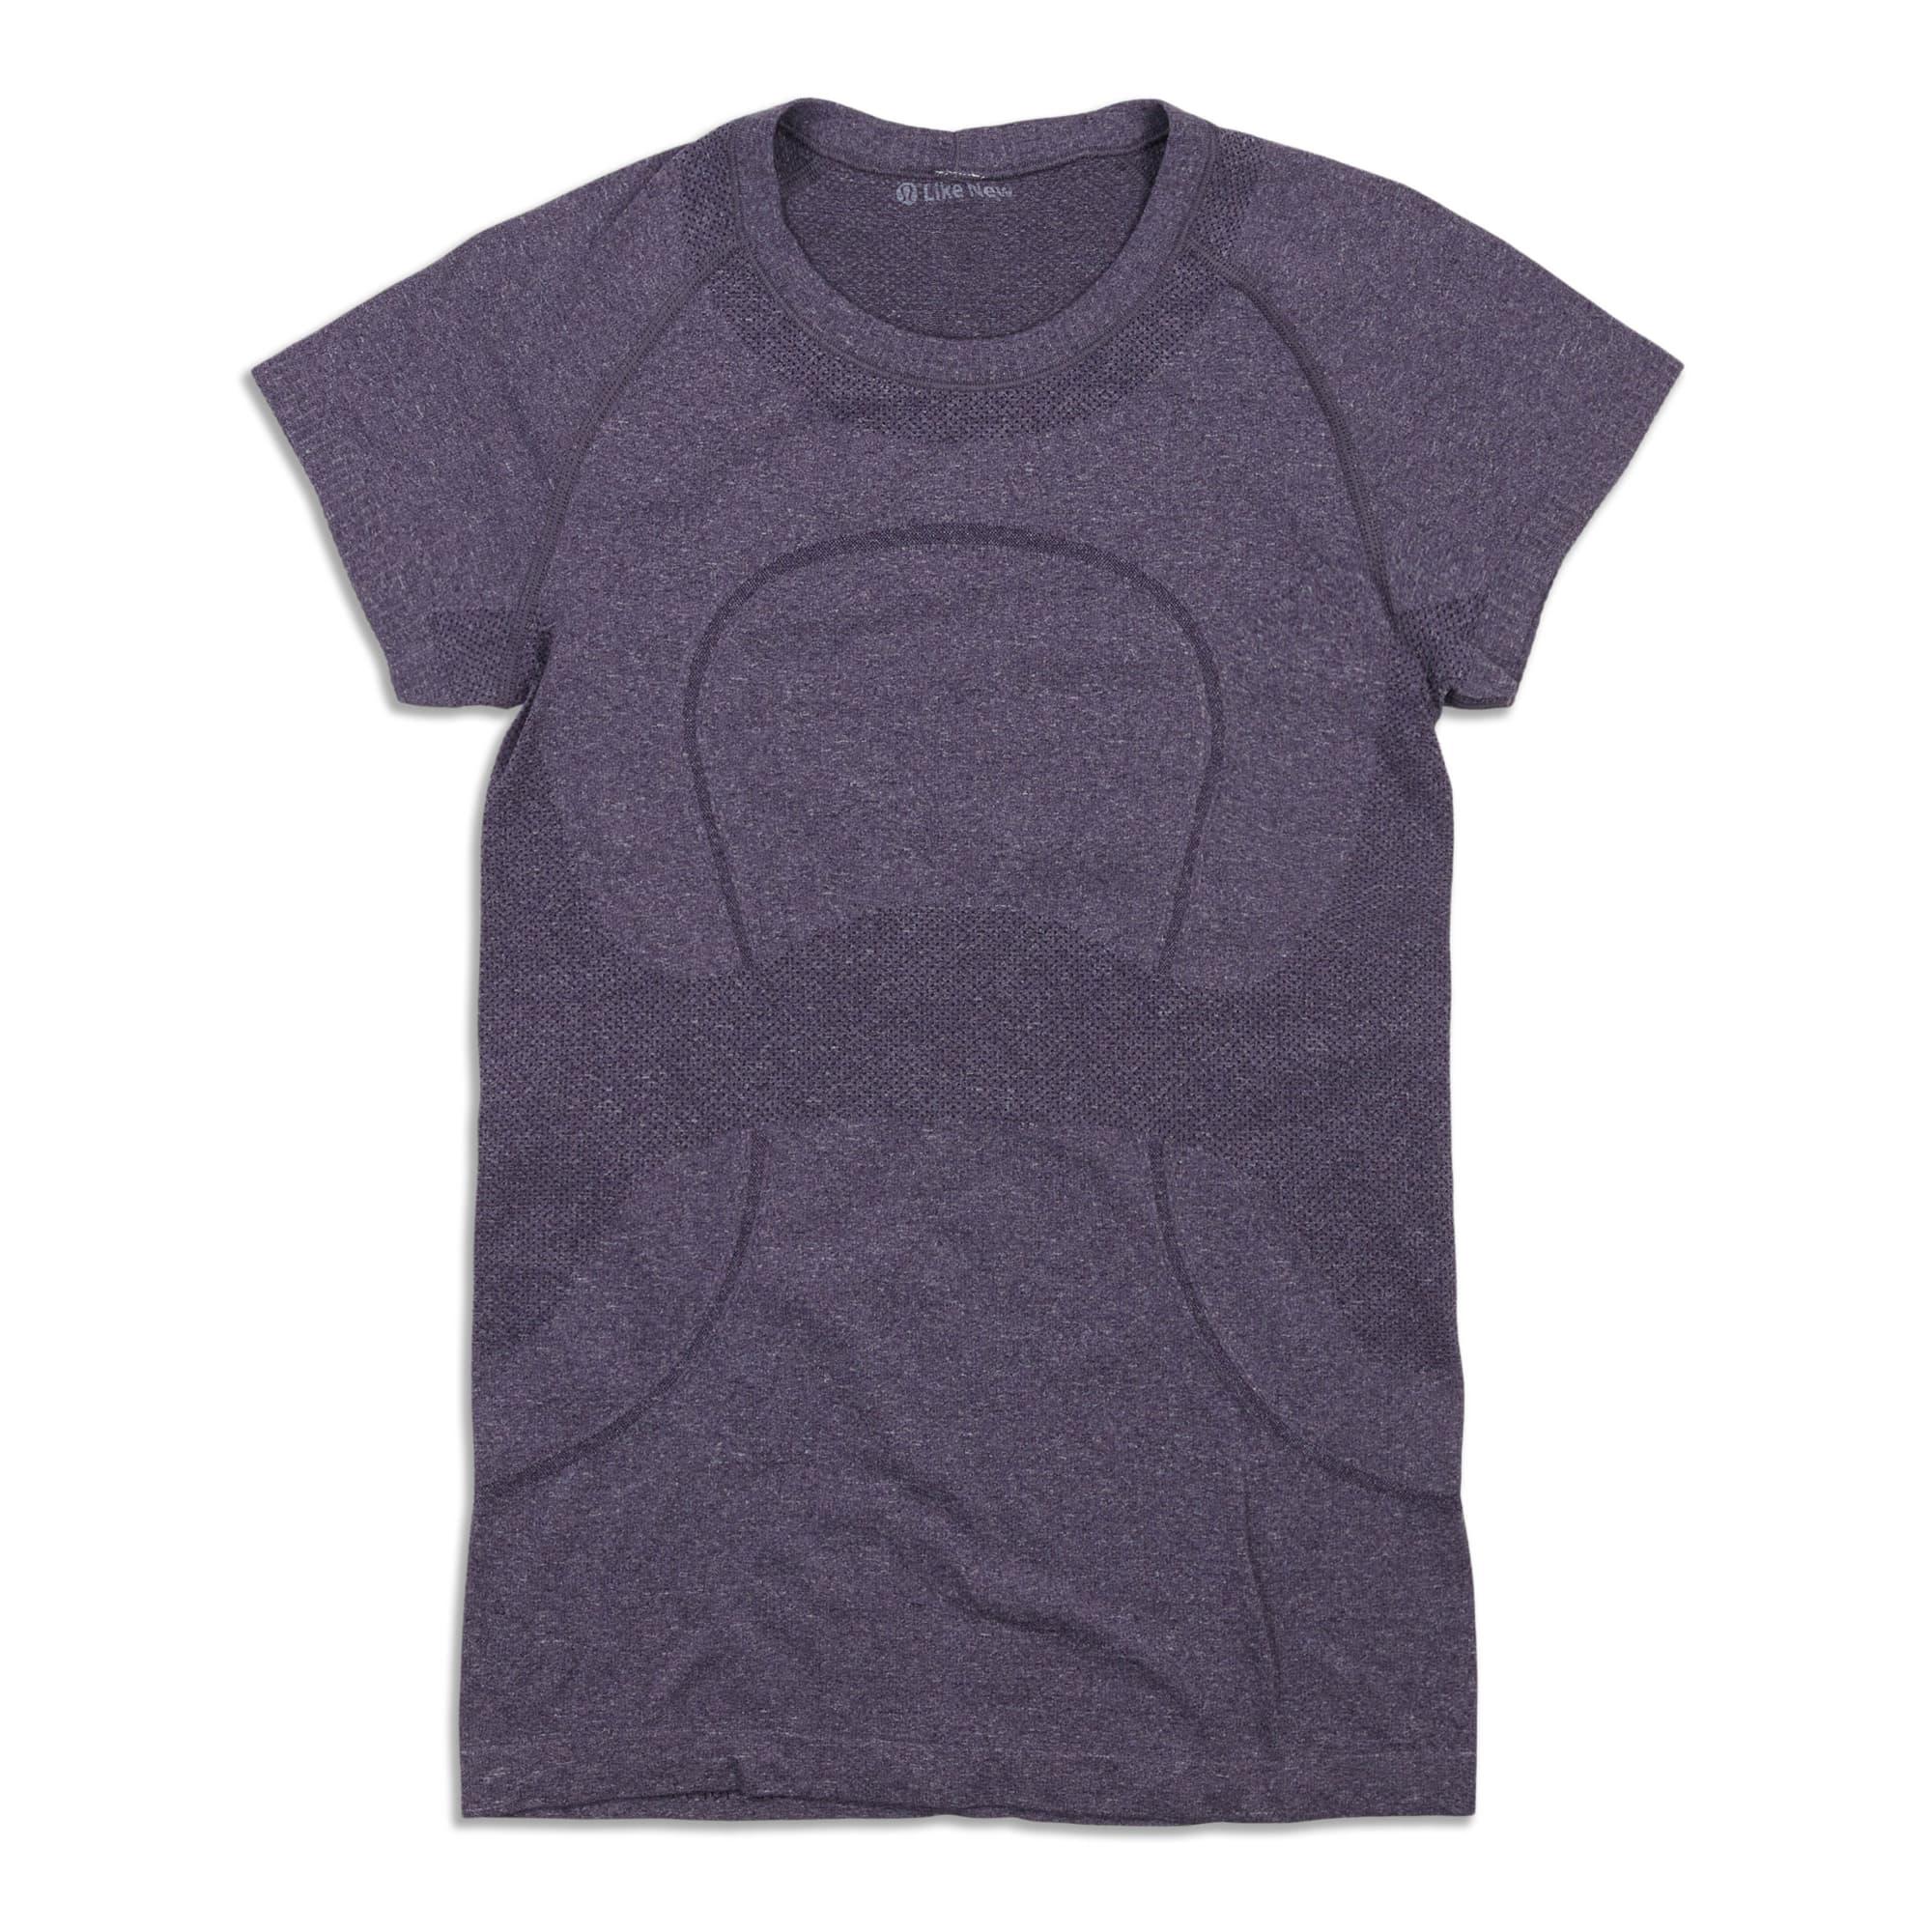 Main product image: Swiftly Tech Short Sleeve Shirt - Resale